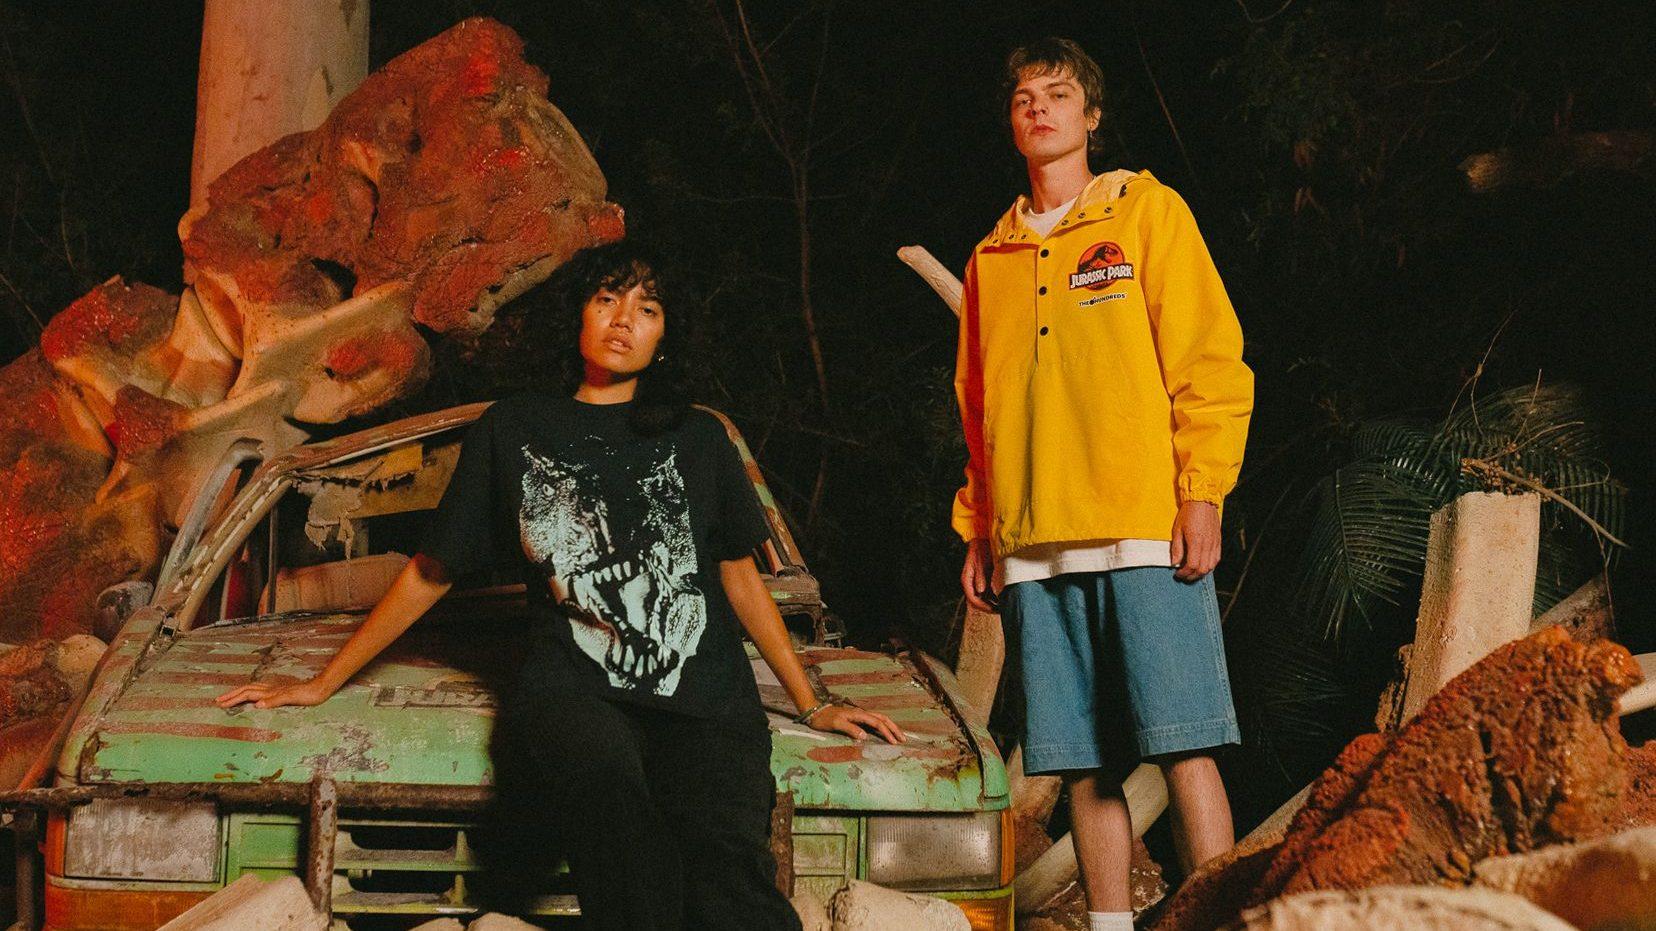 The Hundreds Announces New Jurassic Park Clothing Line